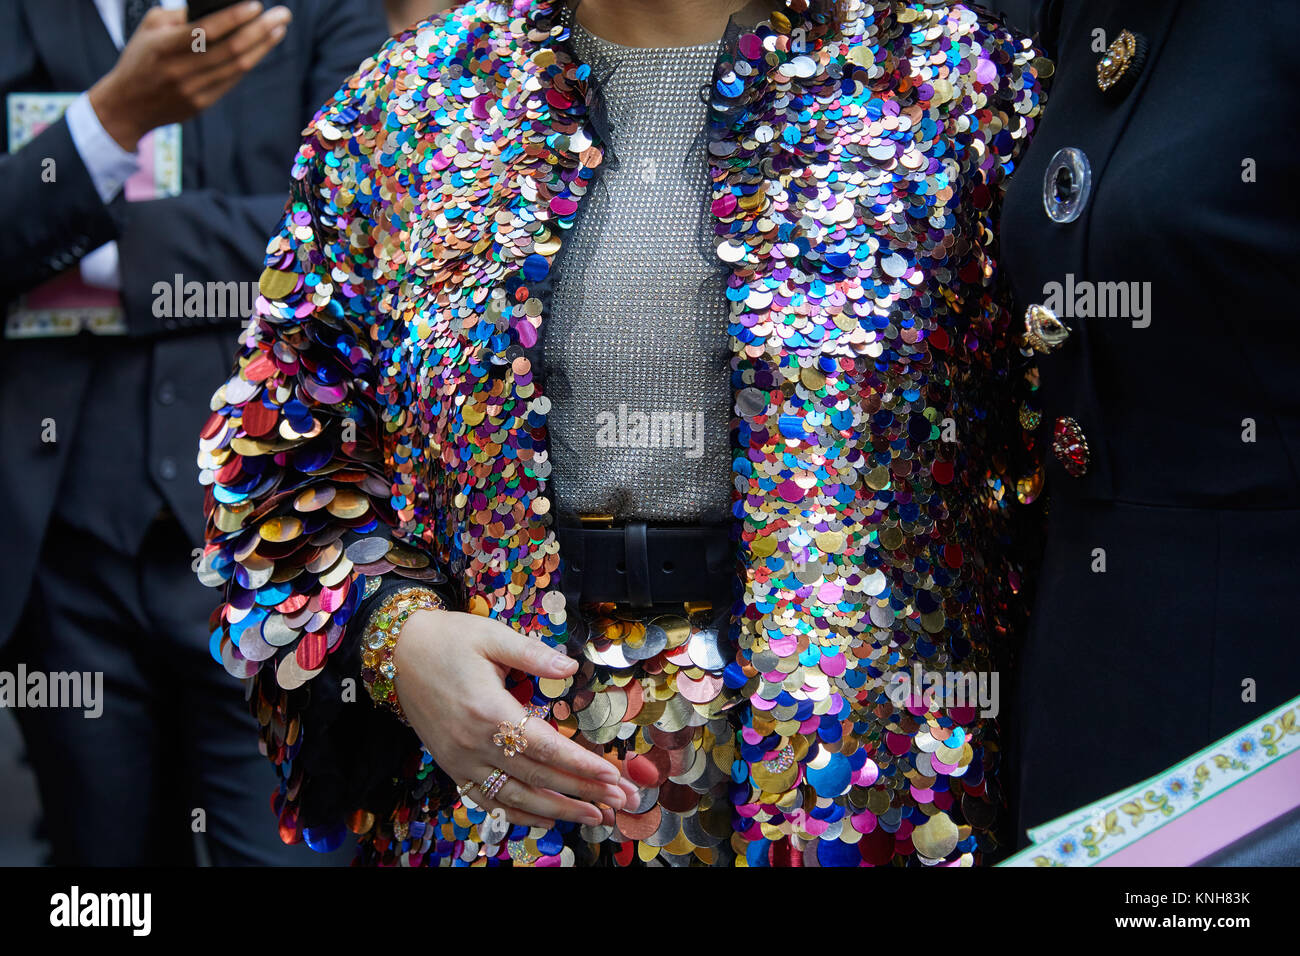 21a871f707f1 Sequin Jacket Stockfotos & Sequin Jacket Bilder - Alamy